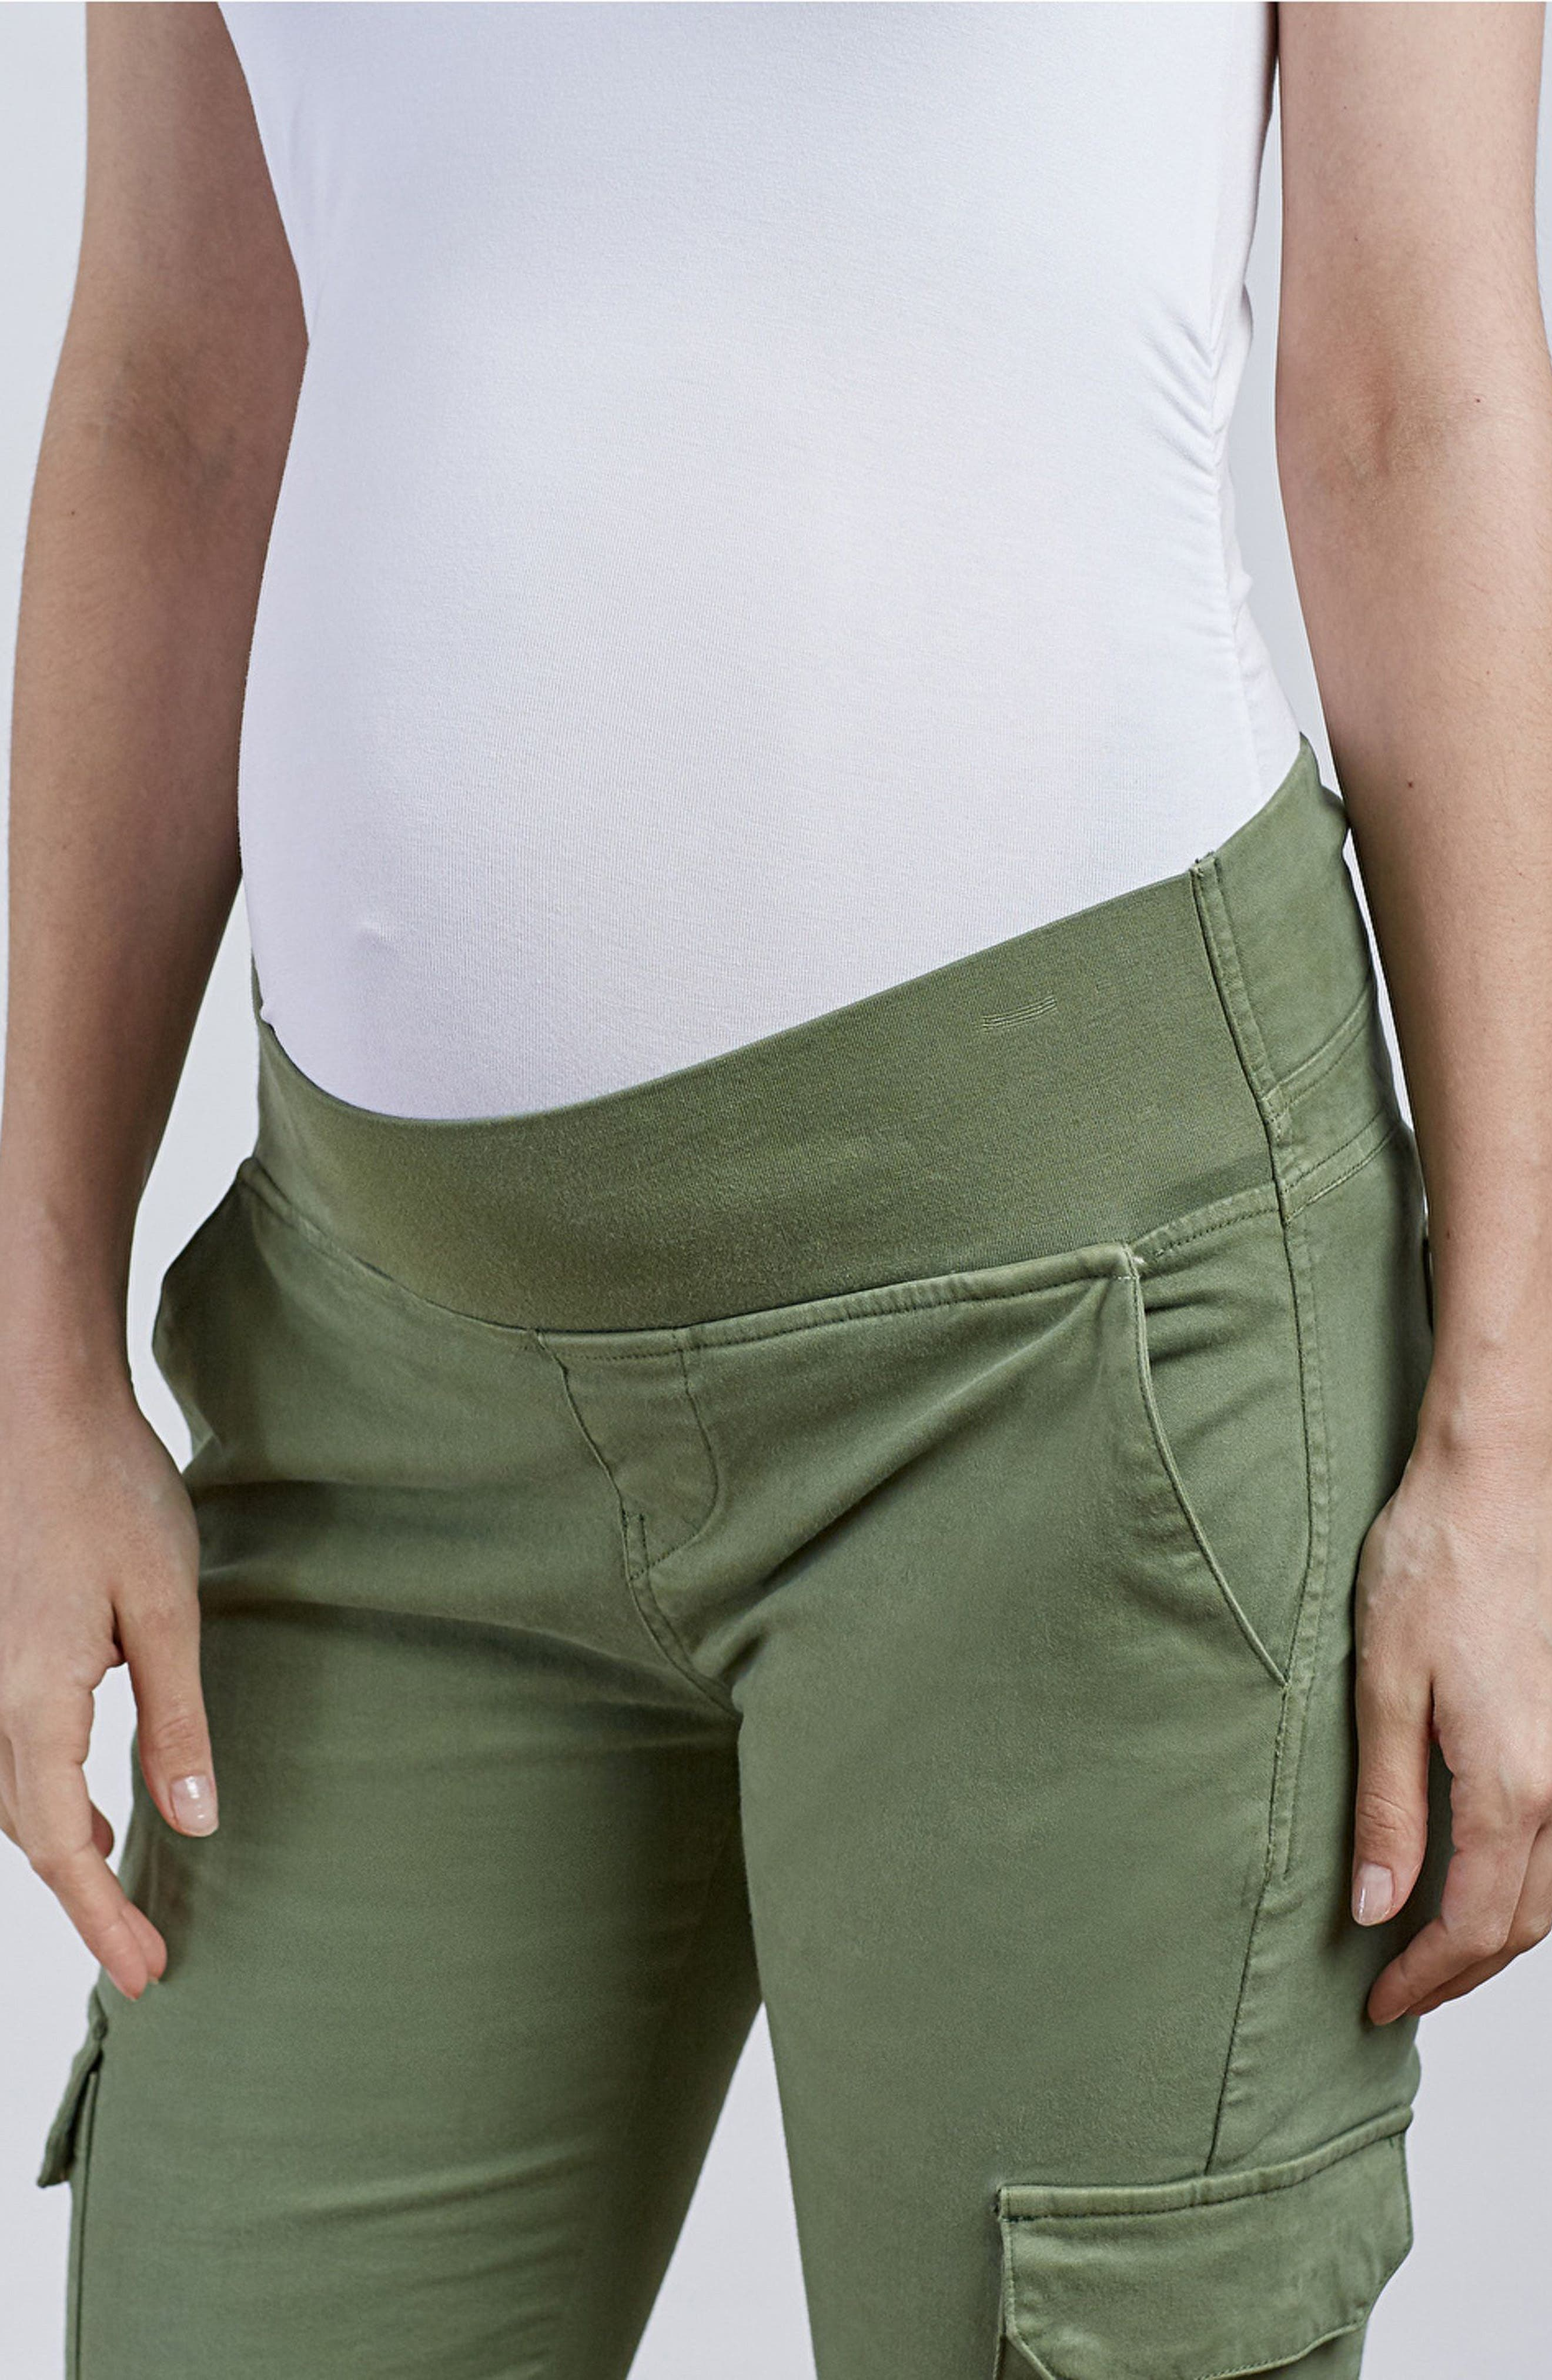 Maternity Cargo Pants,                             Alternate thumbnail 2, color,                             Dusted Khaki